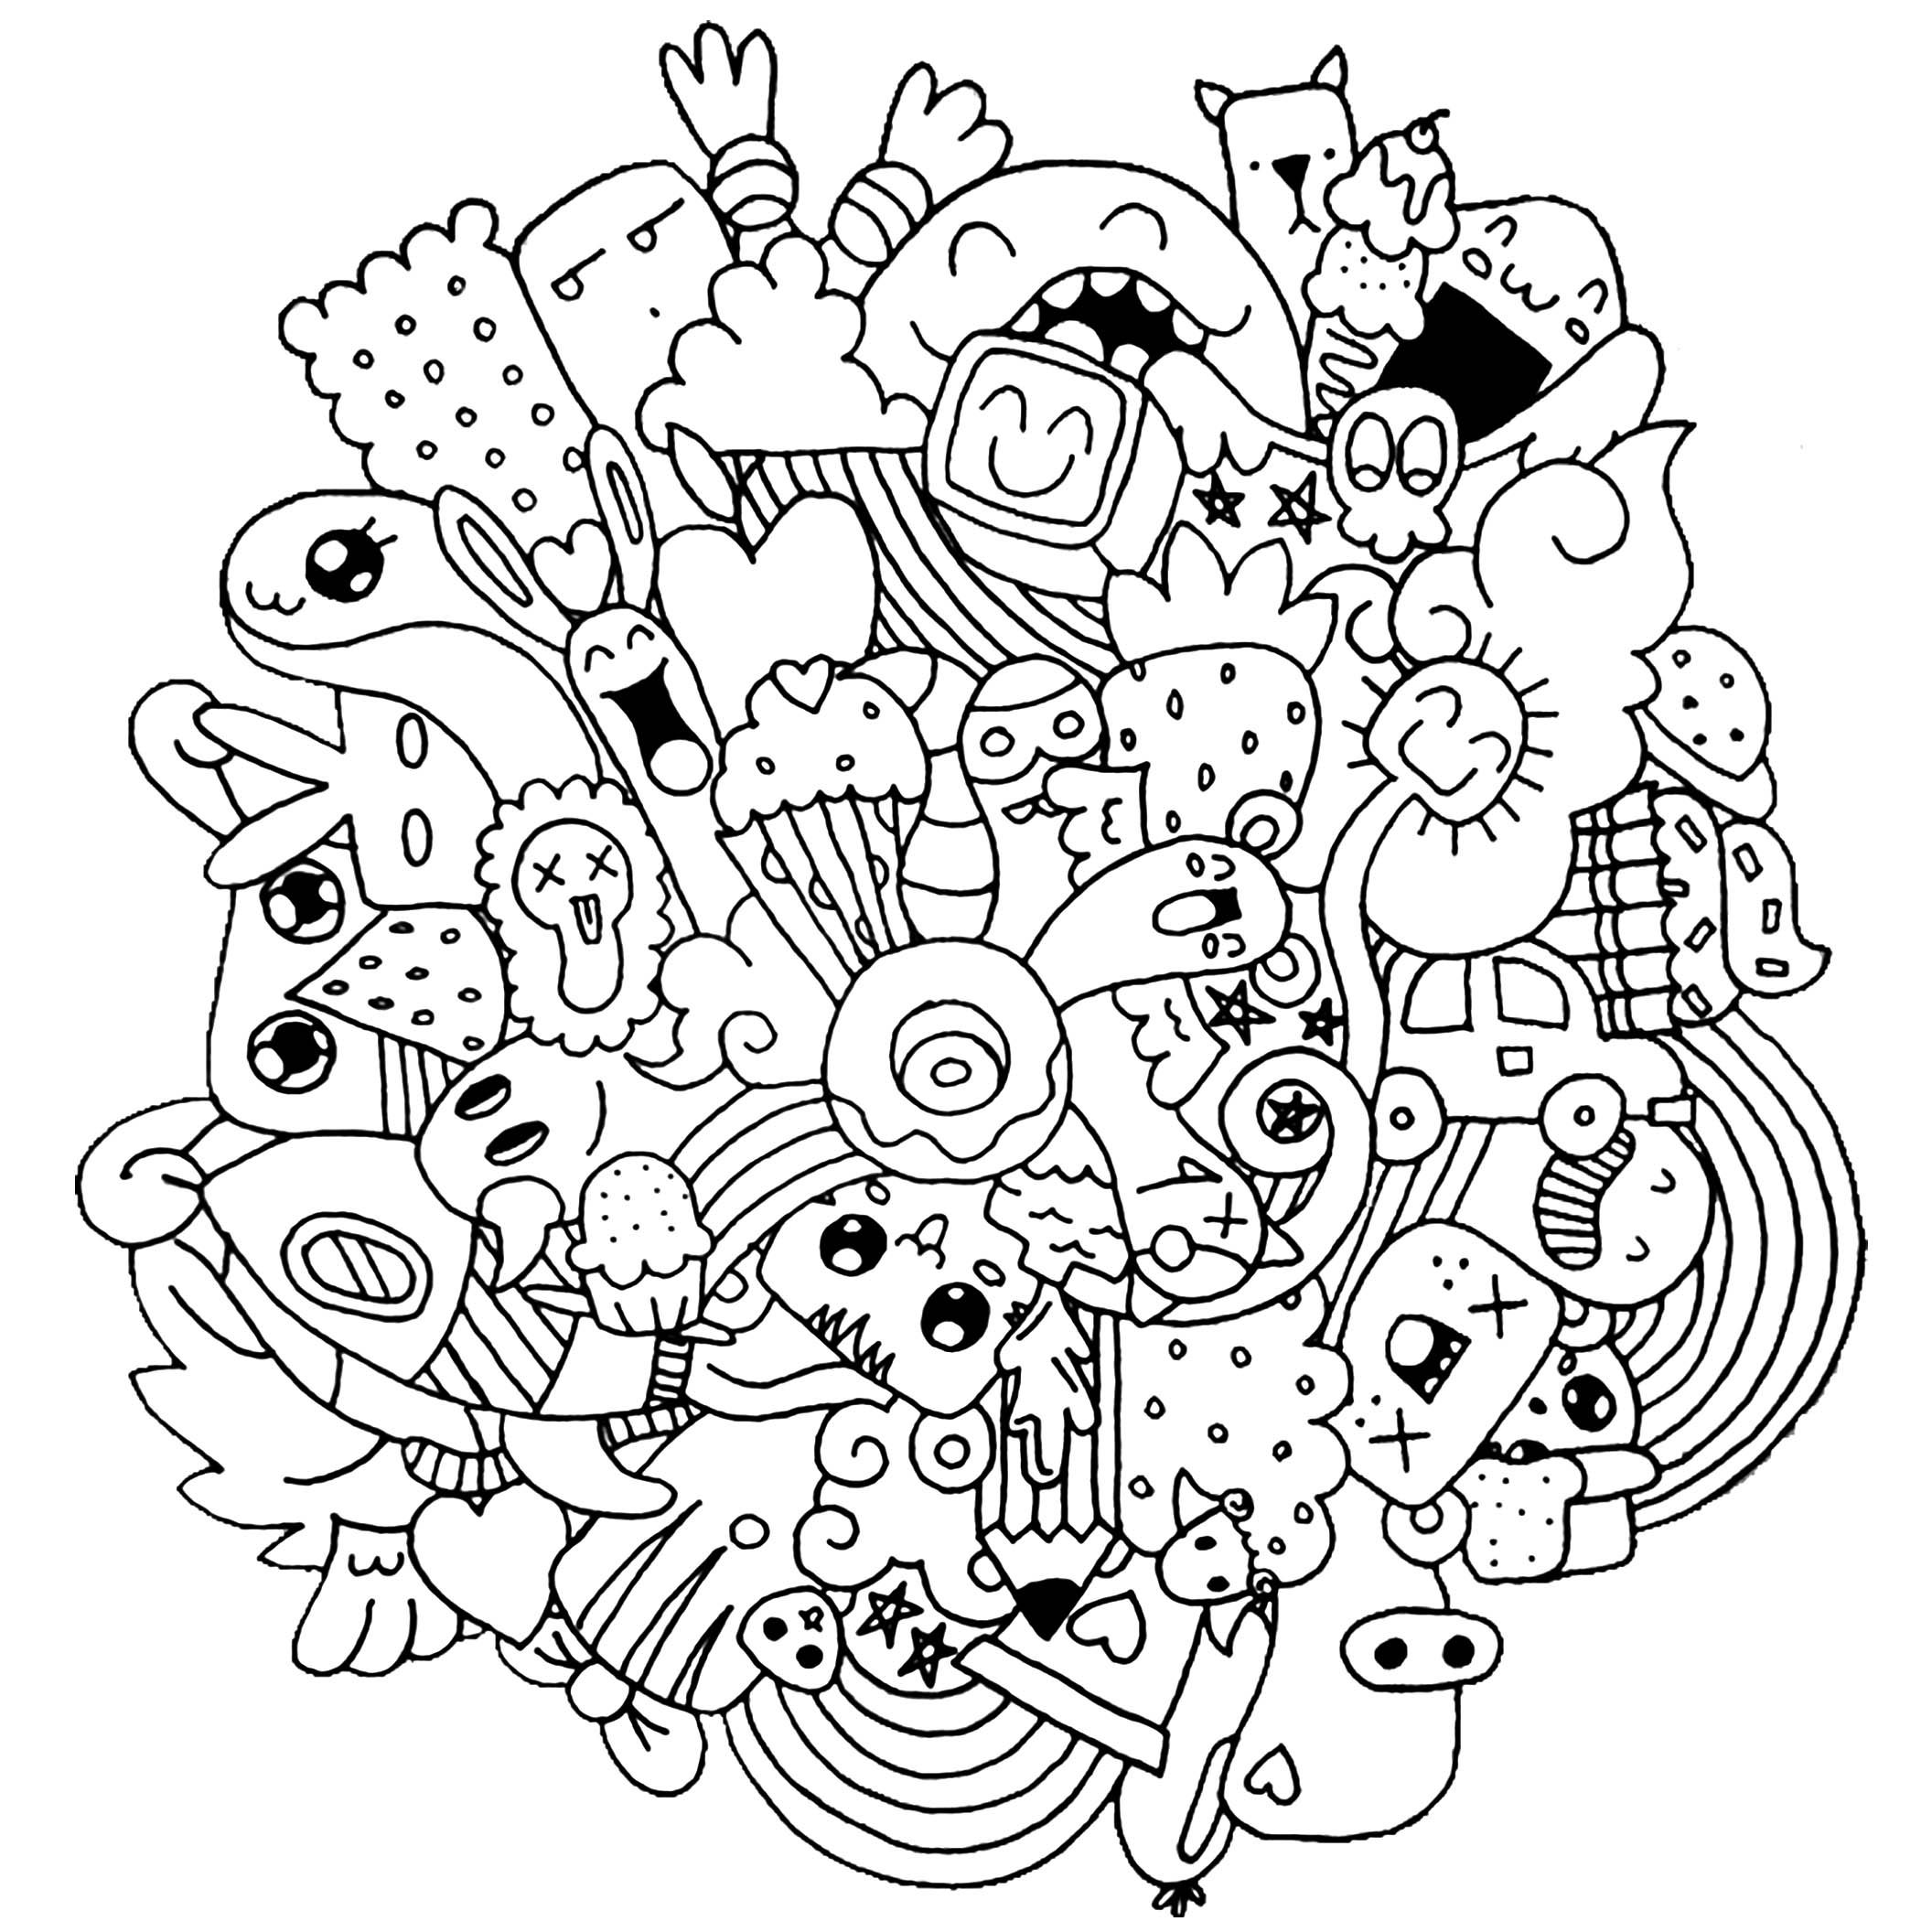 - Strange Creatures - Doodle Art / Doodling Coloring Pages For